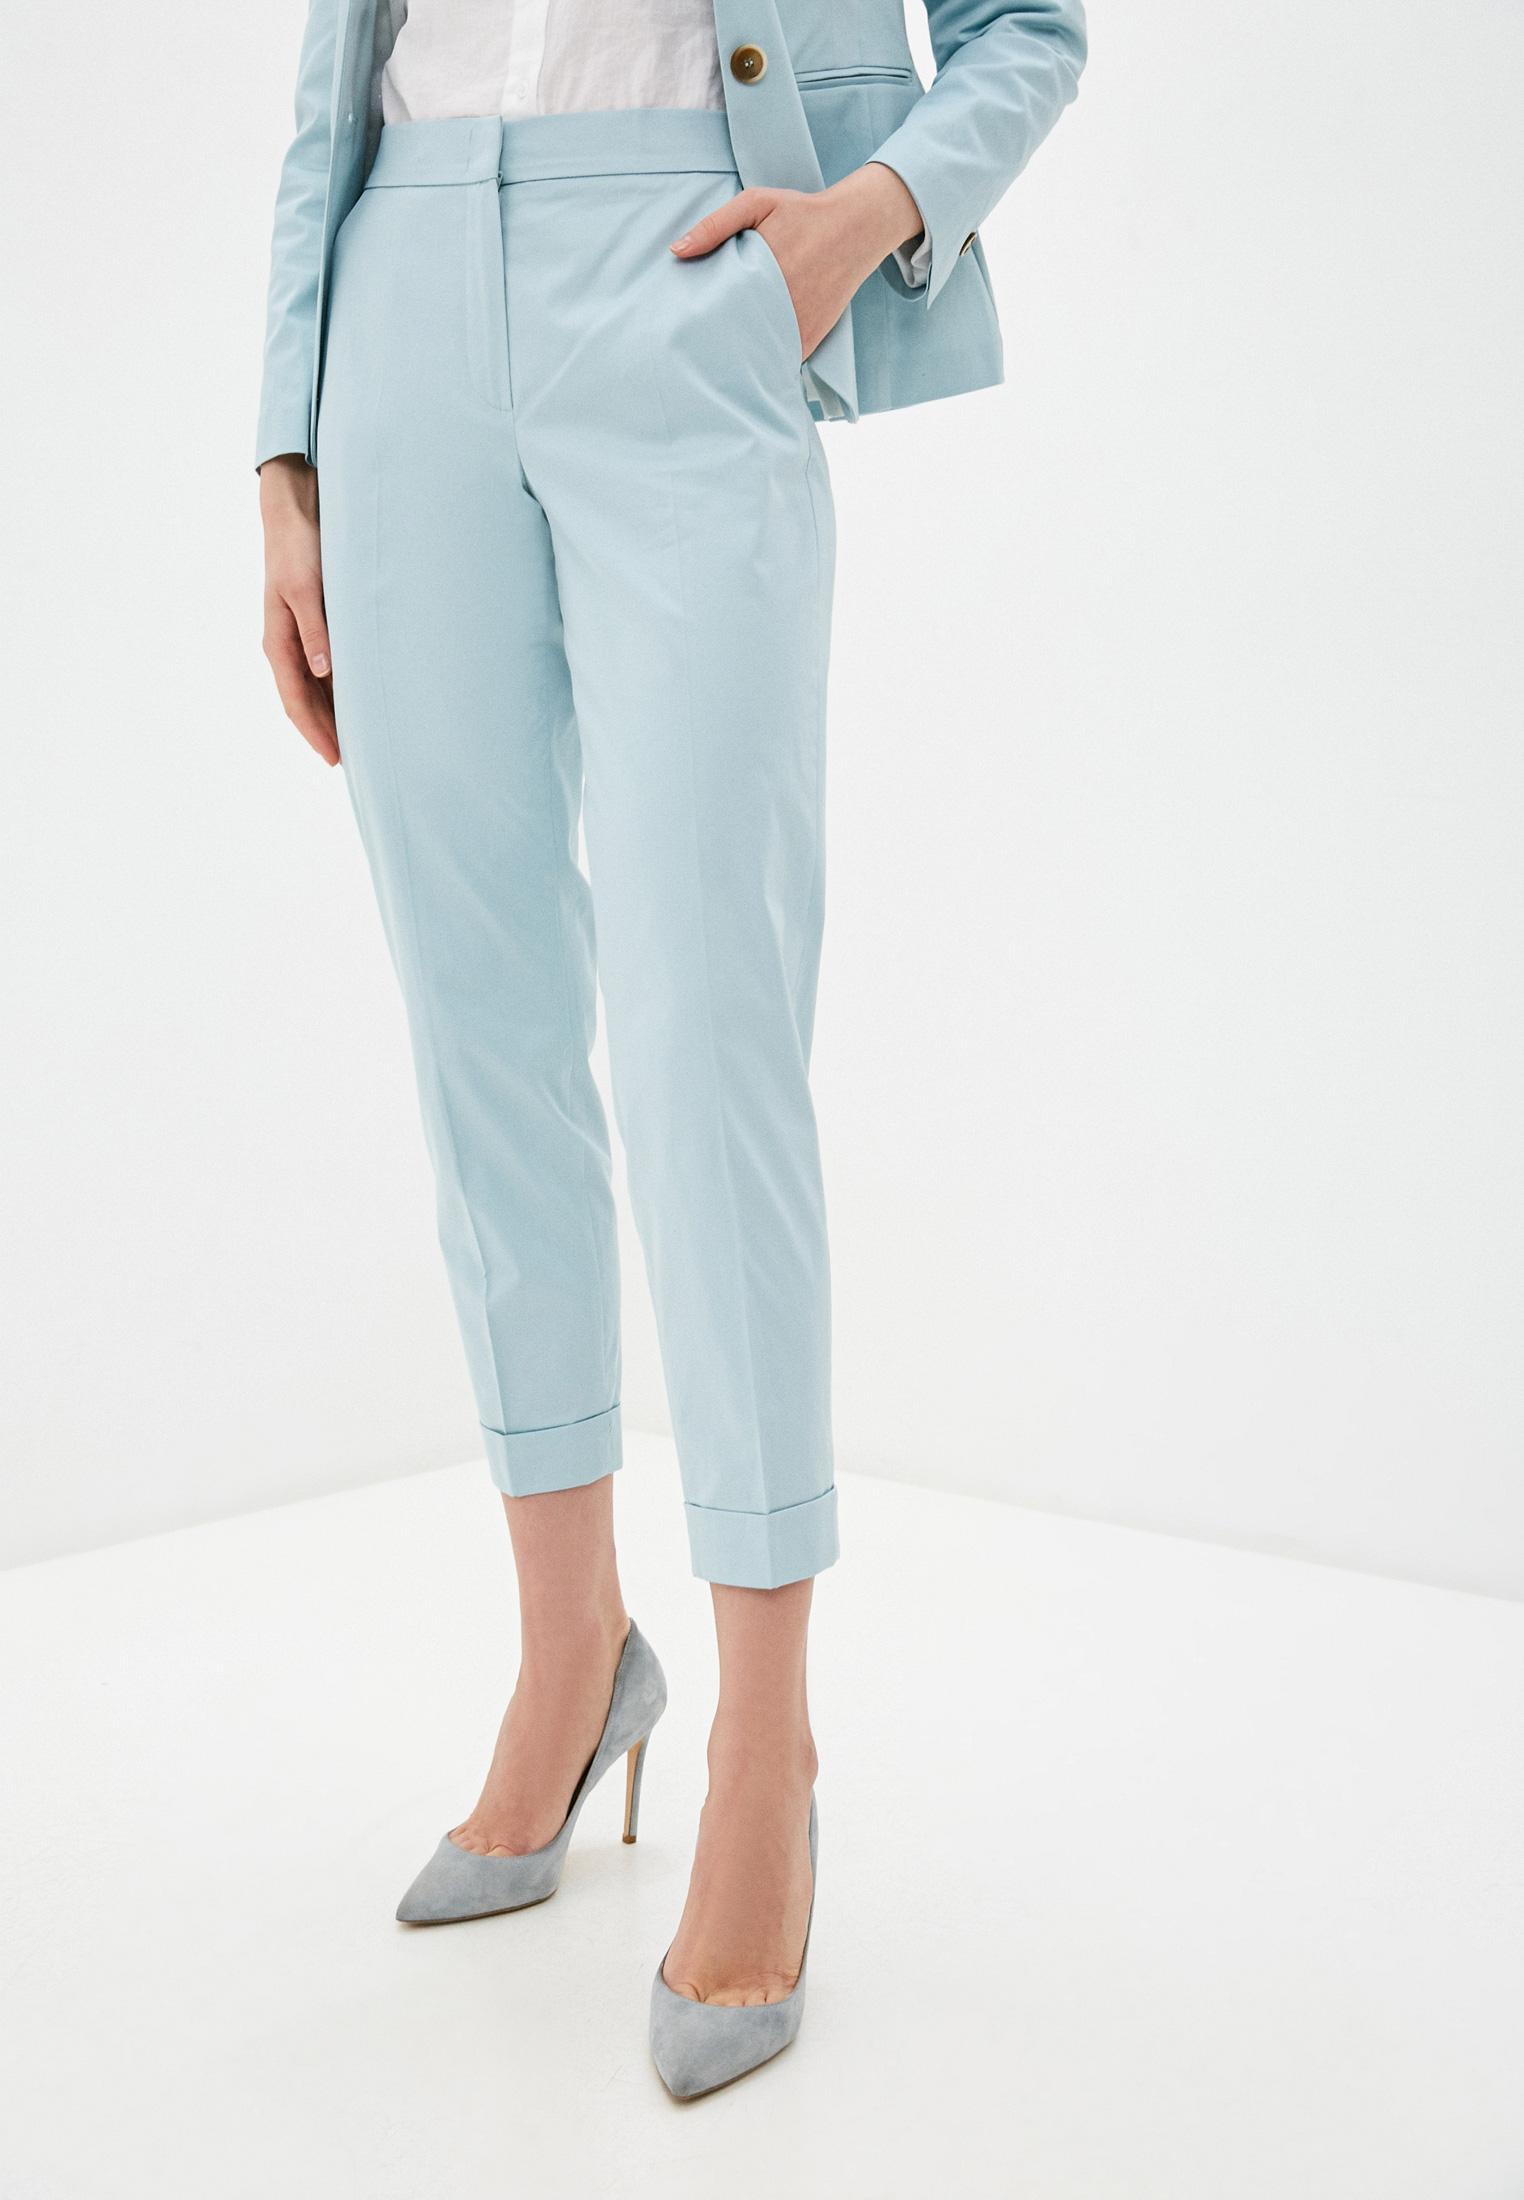 Женские классические брюки Gerry Weber (Гарри Вебер) 320022-31370